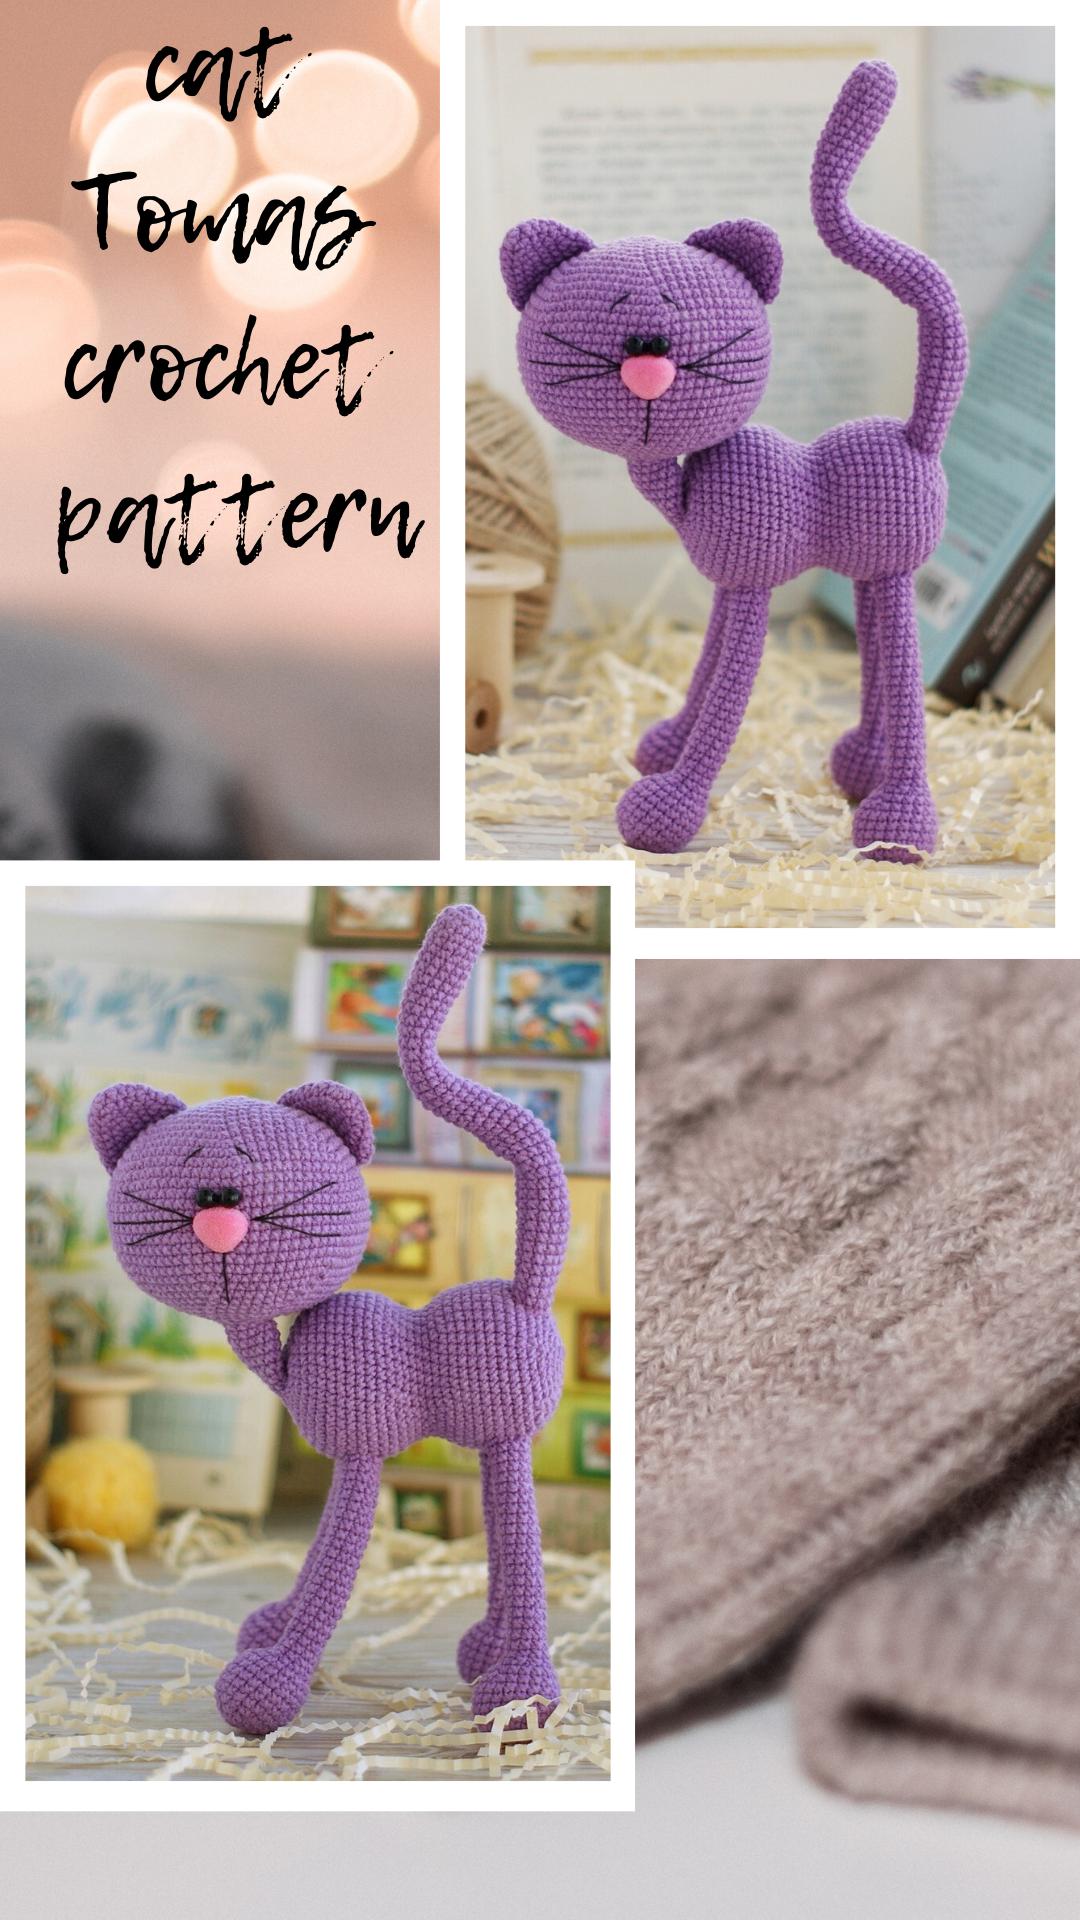 Cat THOMAS - Amigurumi crochet pattern (English only). PDF pattern, instant download, Crochet Cat